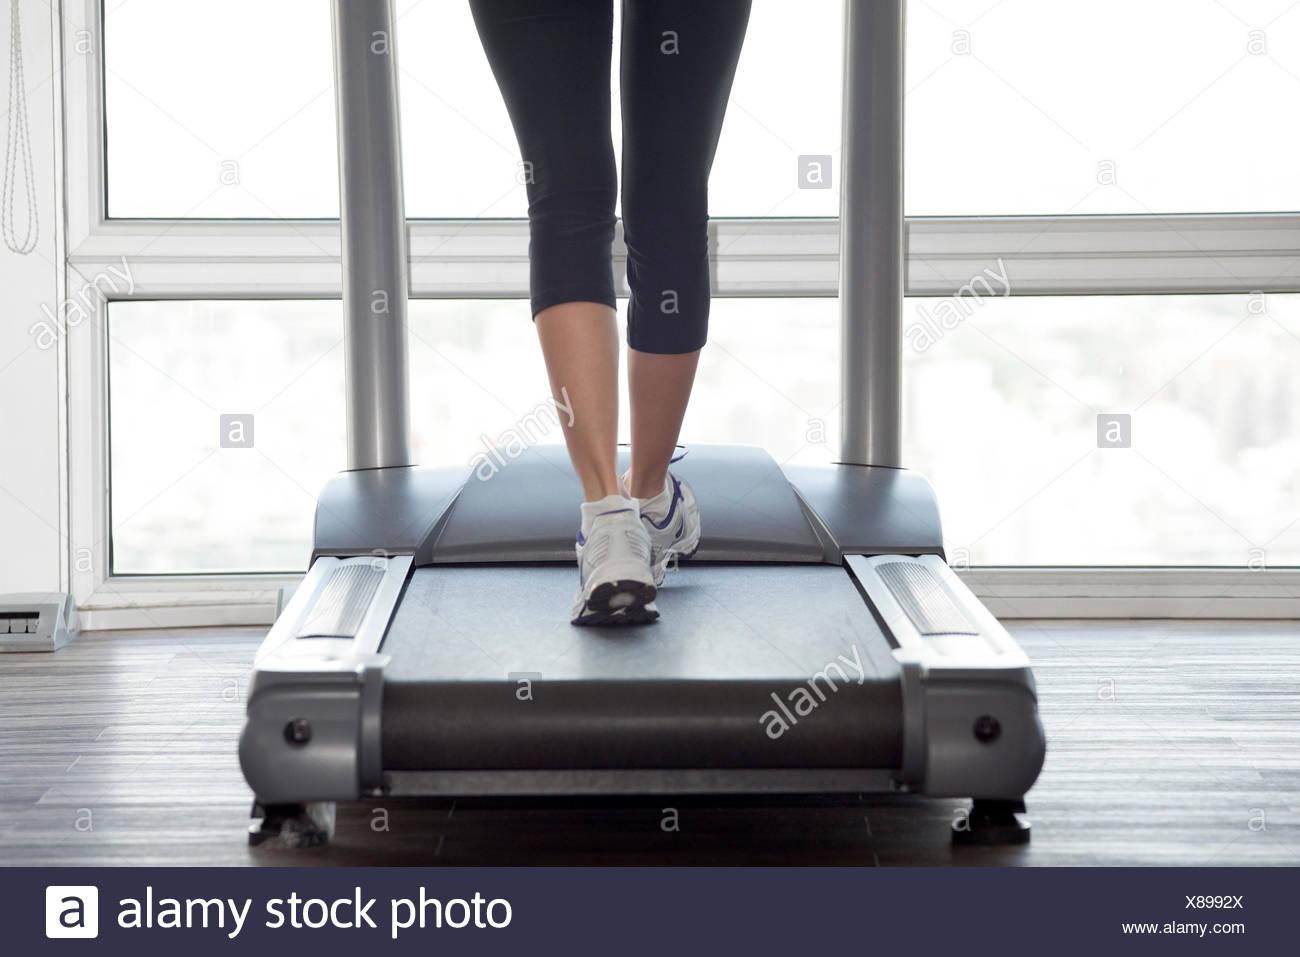 Using treadmill - Stock Image